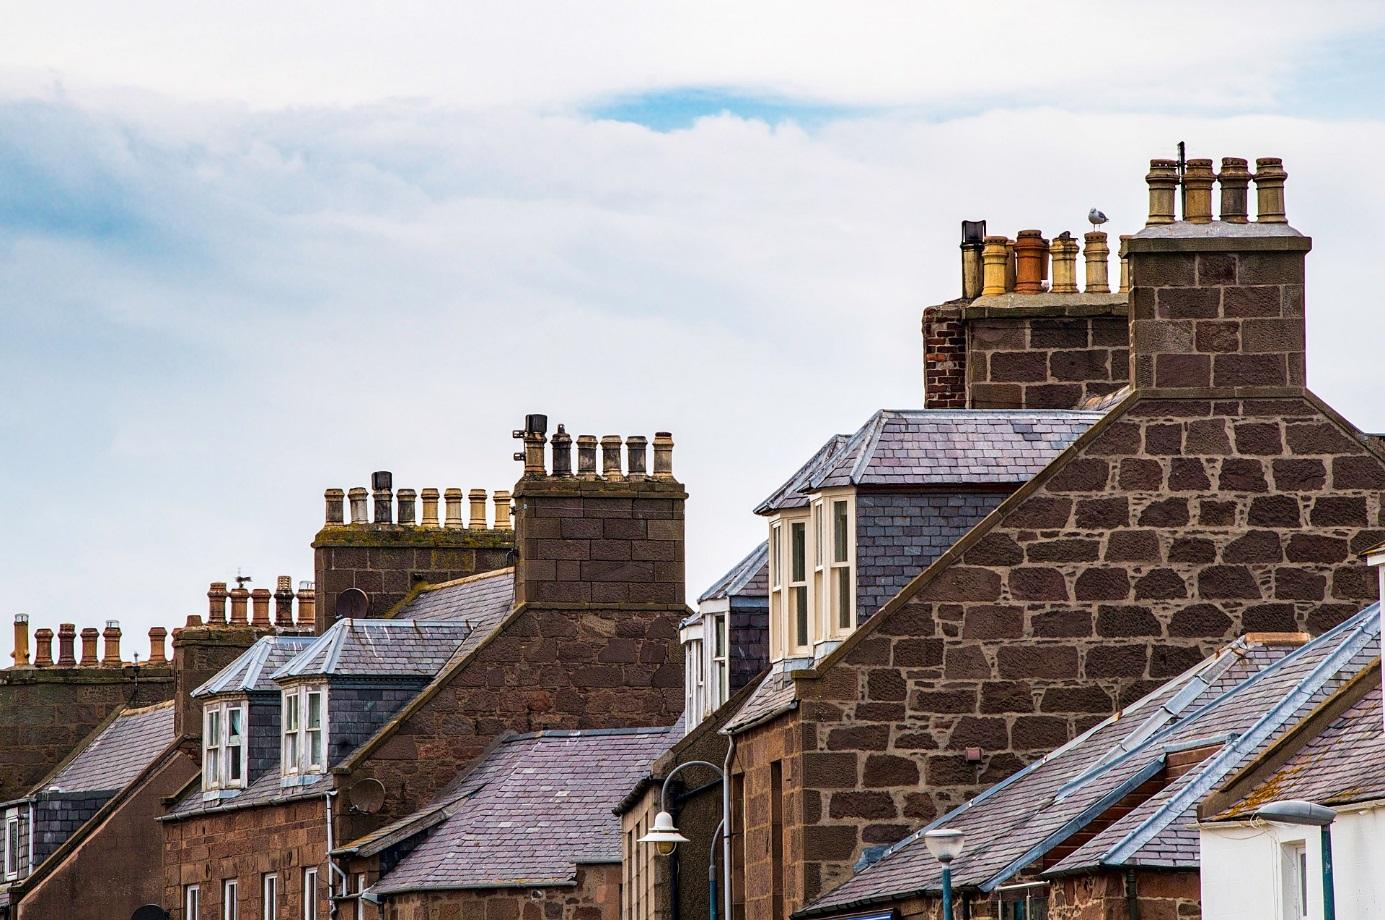 investissement immobilier dasn l'ancien